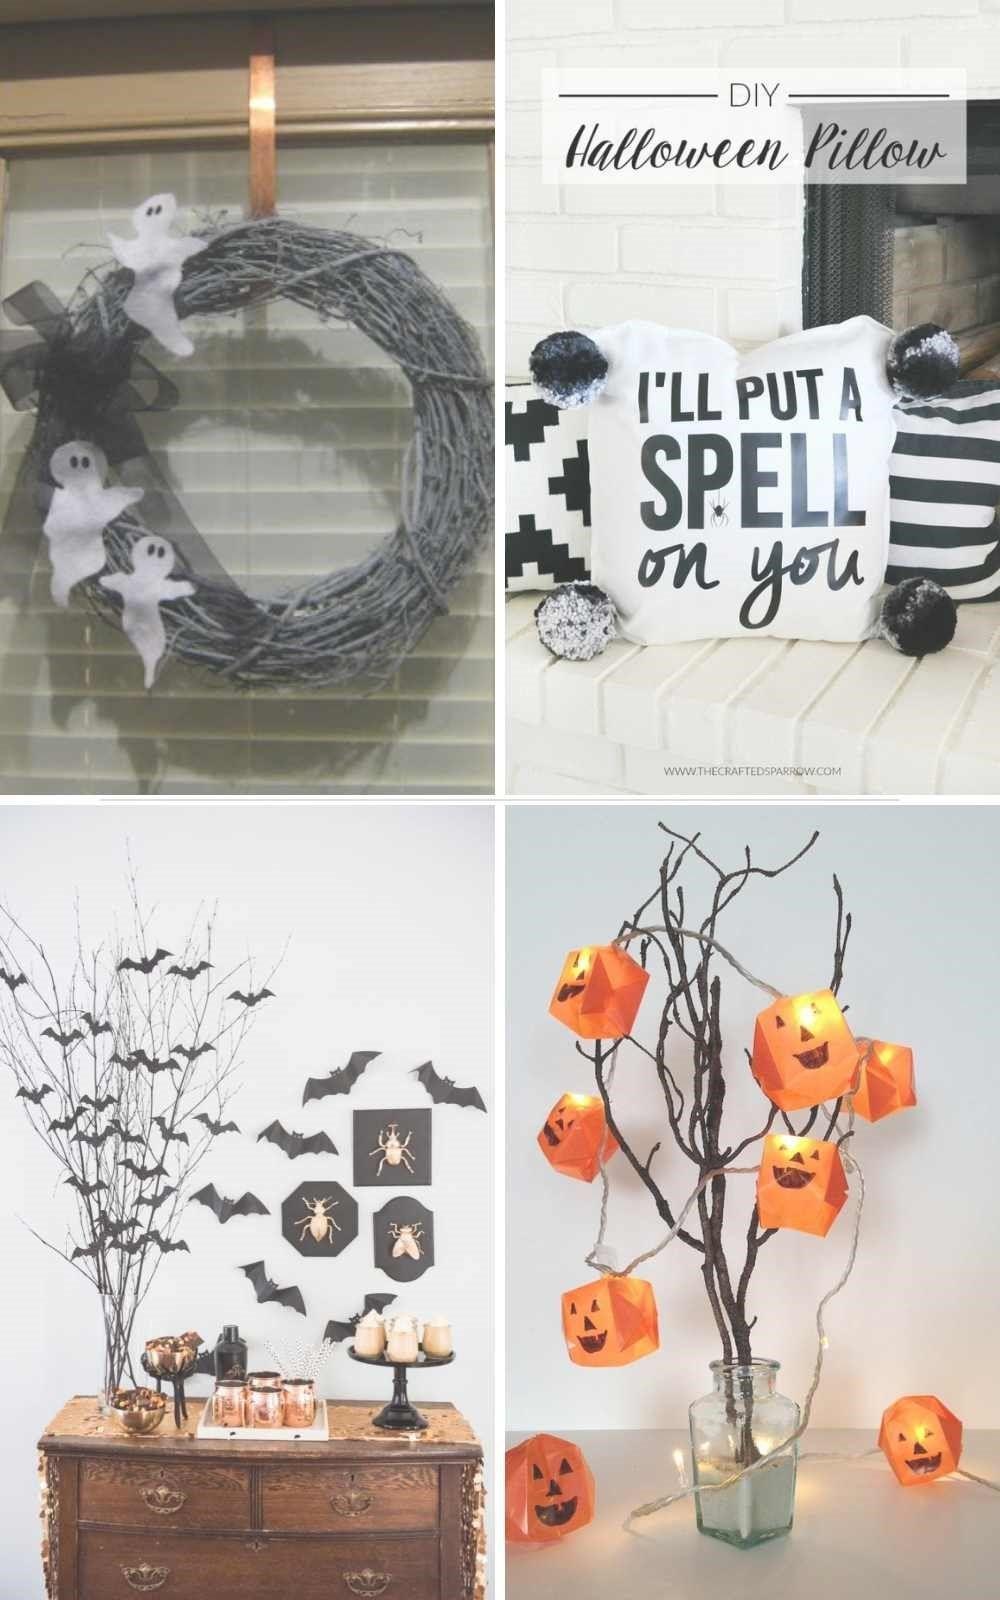 Halloween Decorations Asda, Halloween Decorations